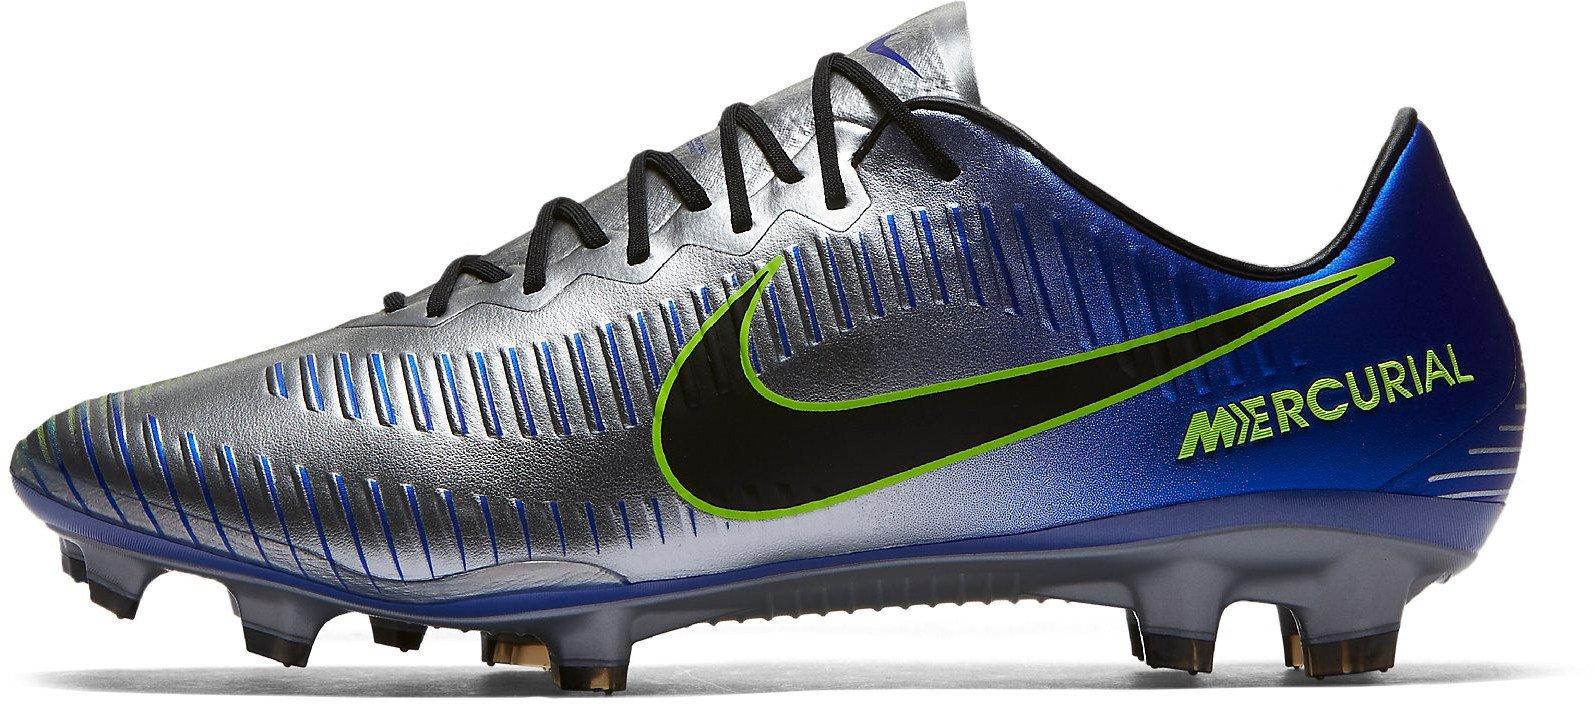 Football shoes Nike MERCURIAL VAPOR XI